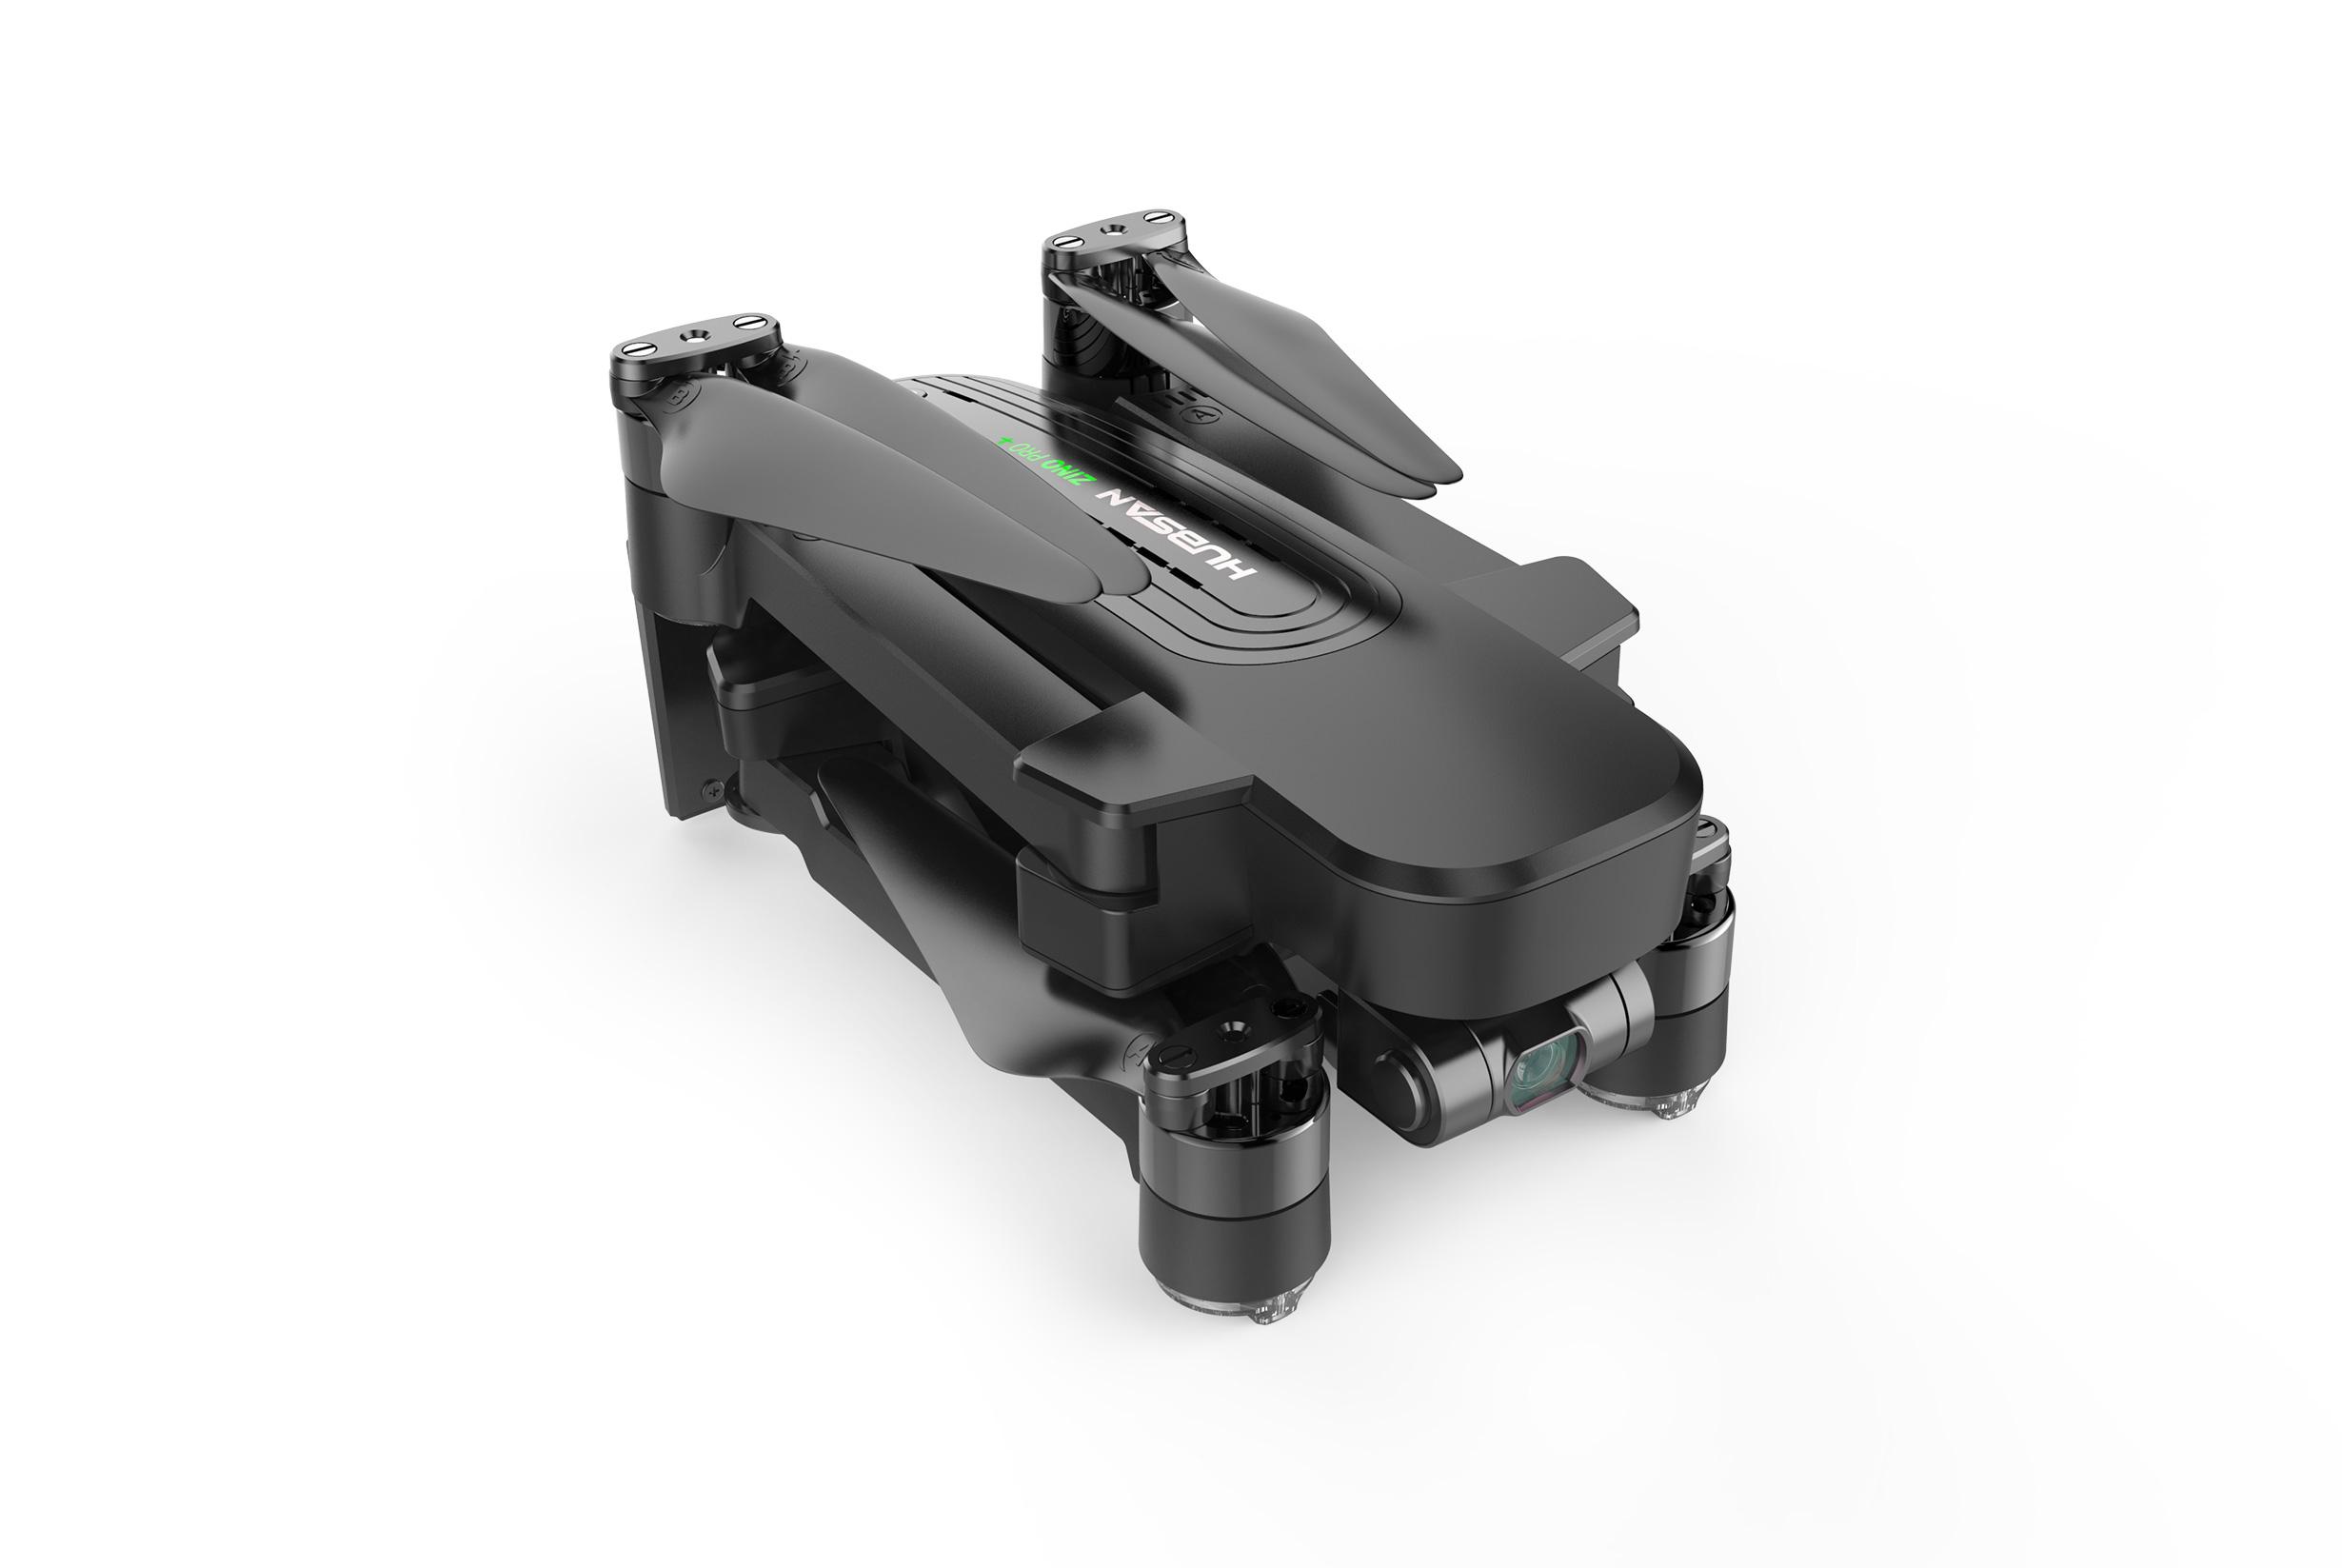 Радиоуправляемый квадрокоптер Hubsan Zino H117S Pro Plus — Zino Pro Plus+Bag+EB-2